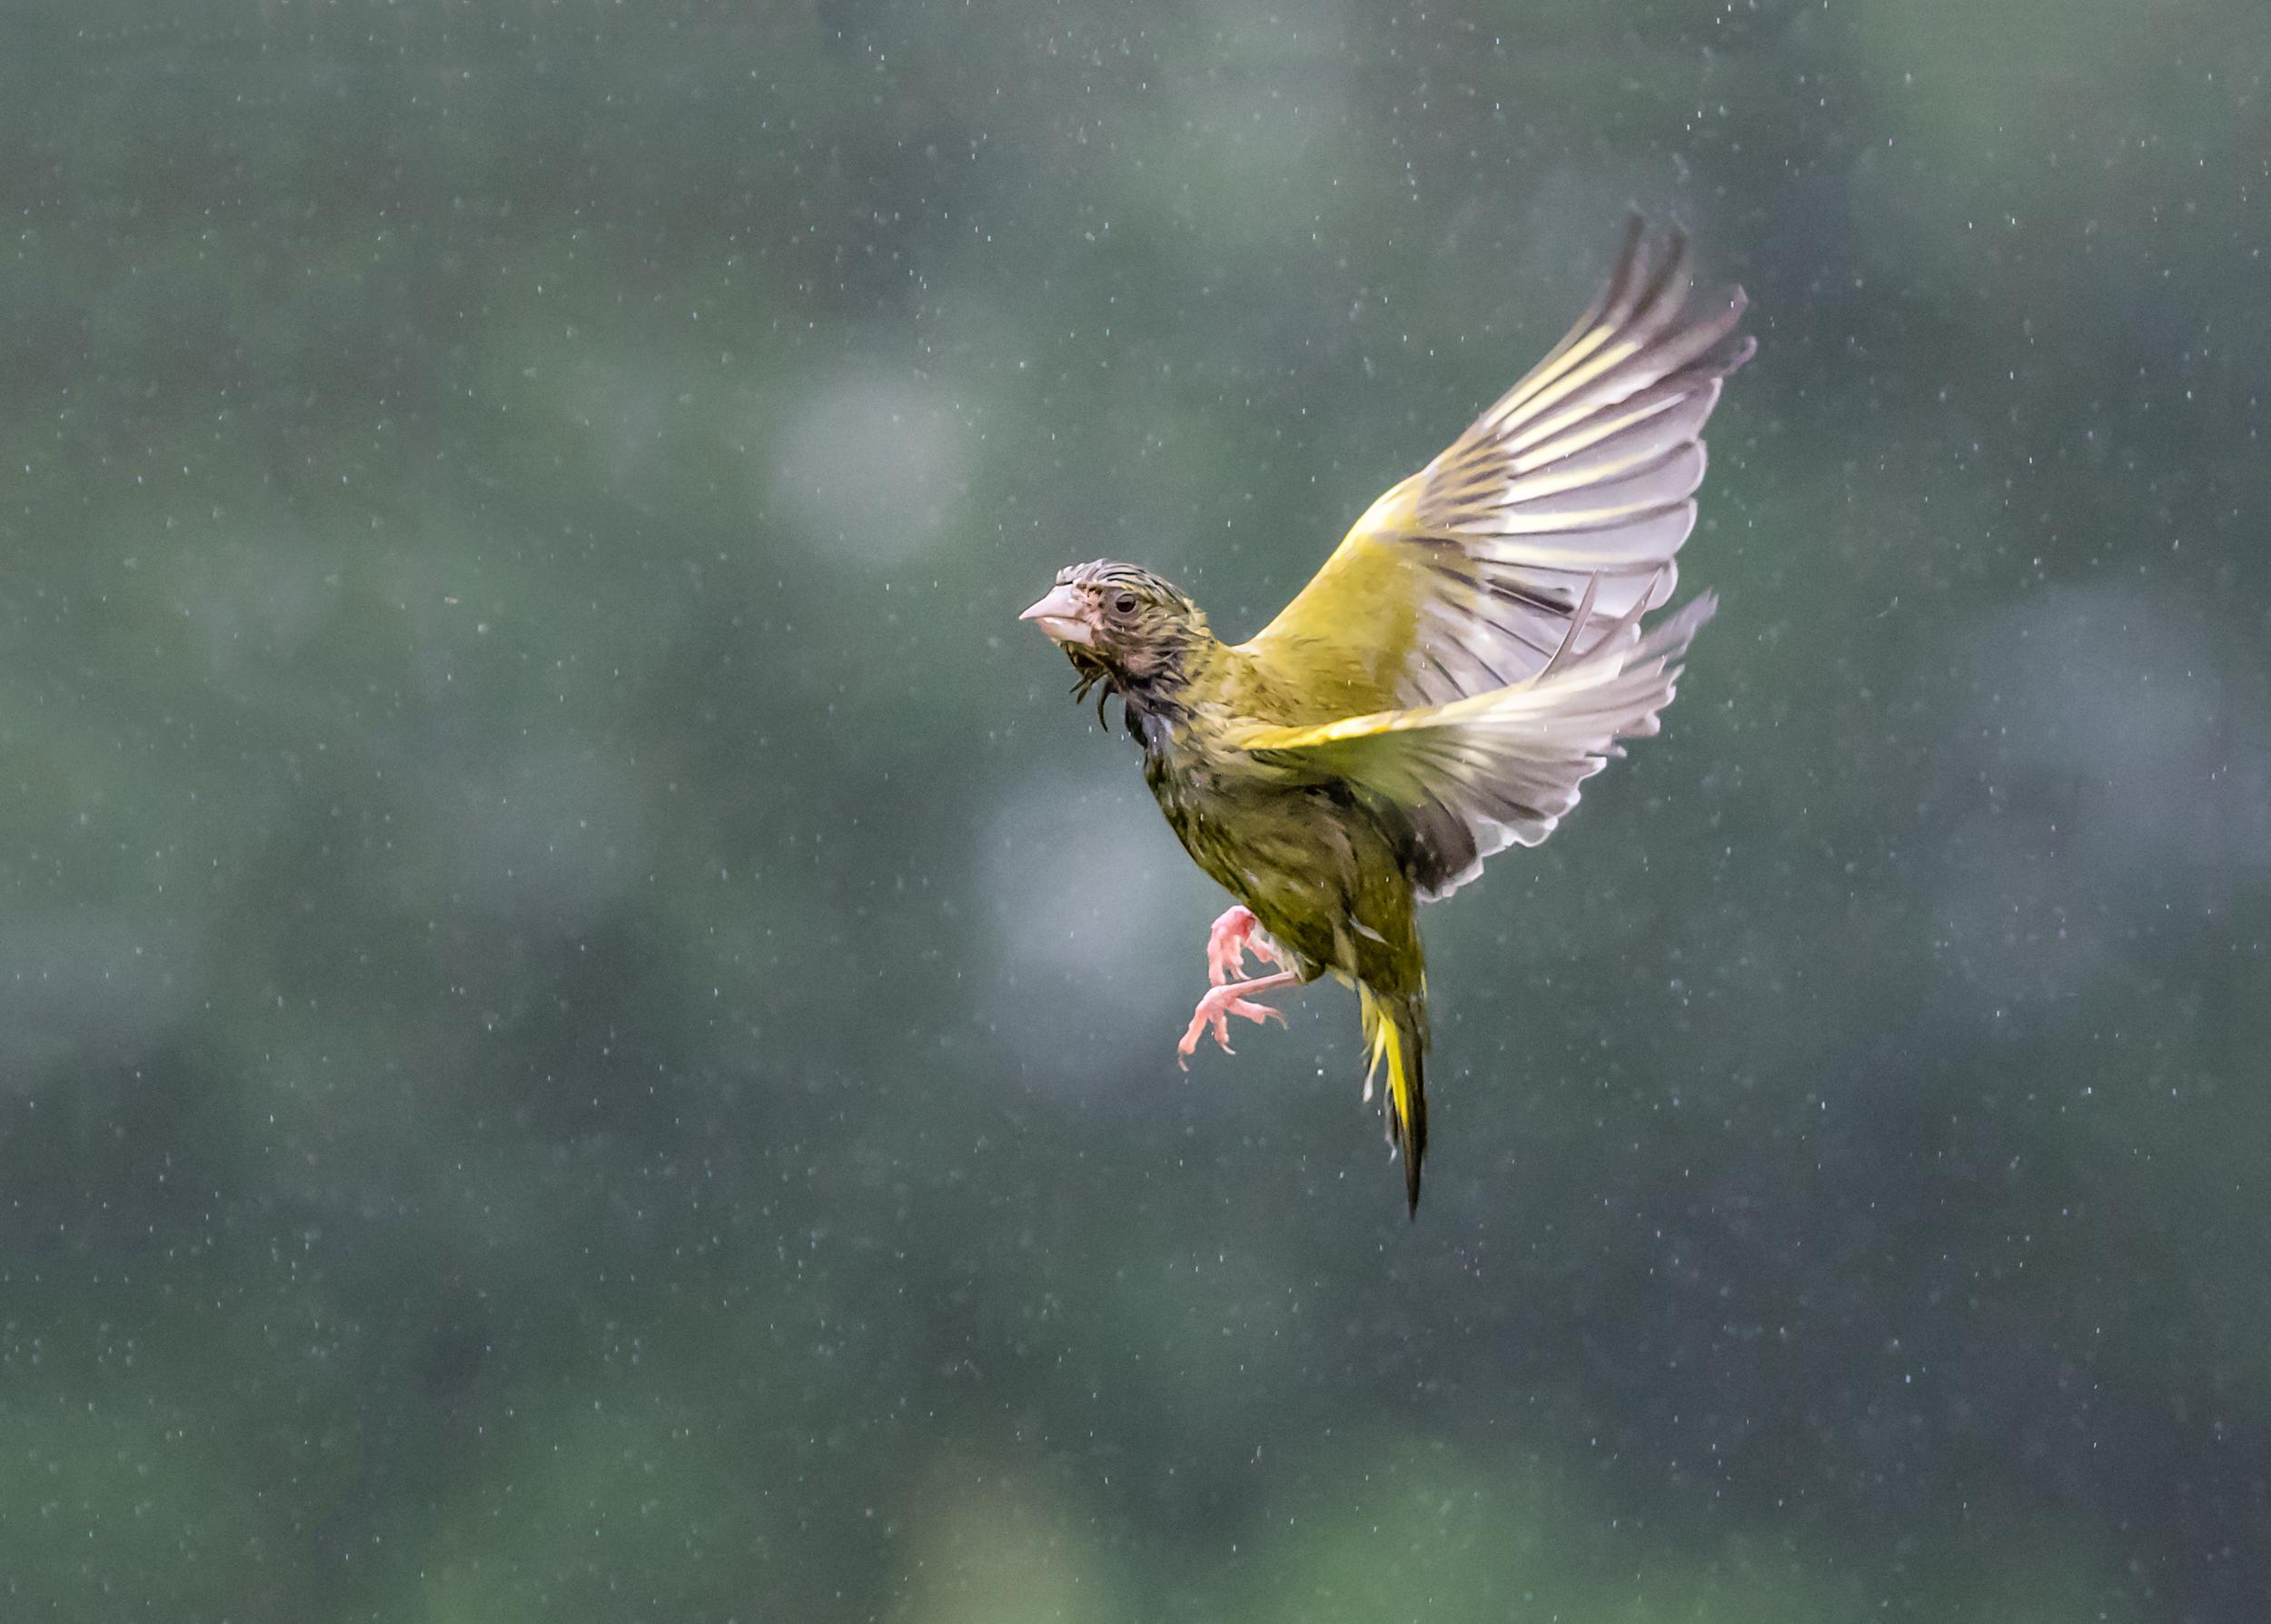 A soaking wet Greenfinch!